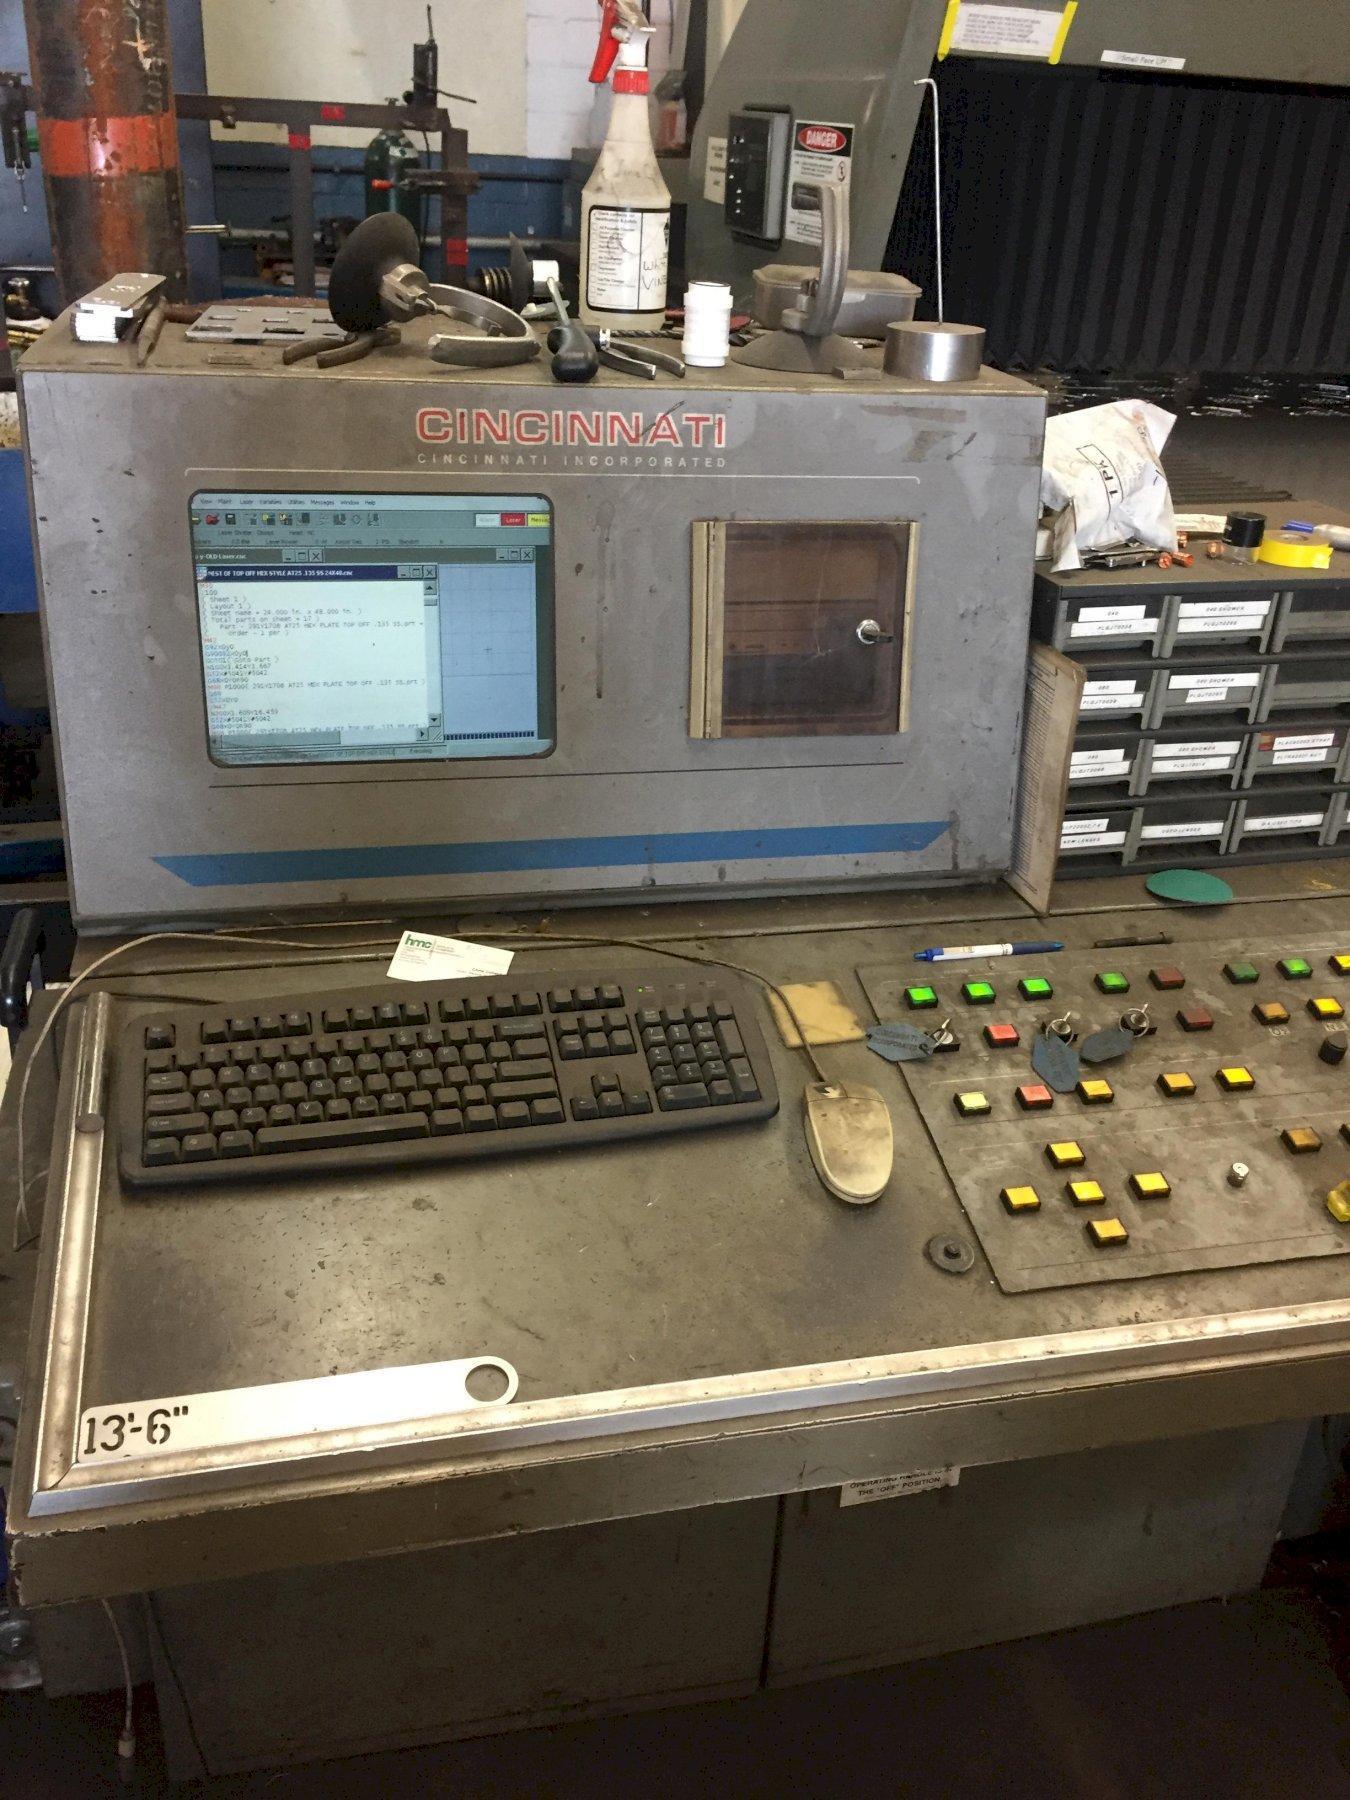 1998 Cincinnati CL707, 5x10, 2500 Watt C02 CNC Laser